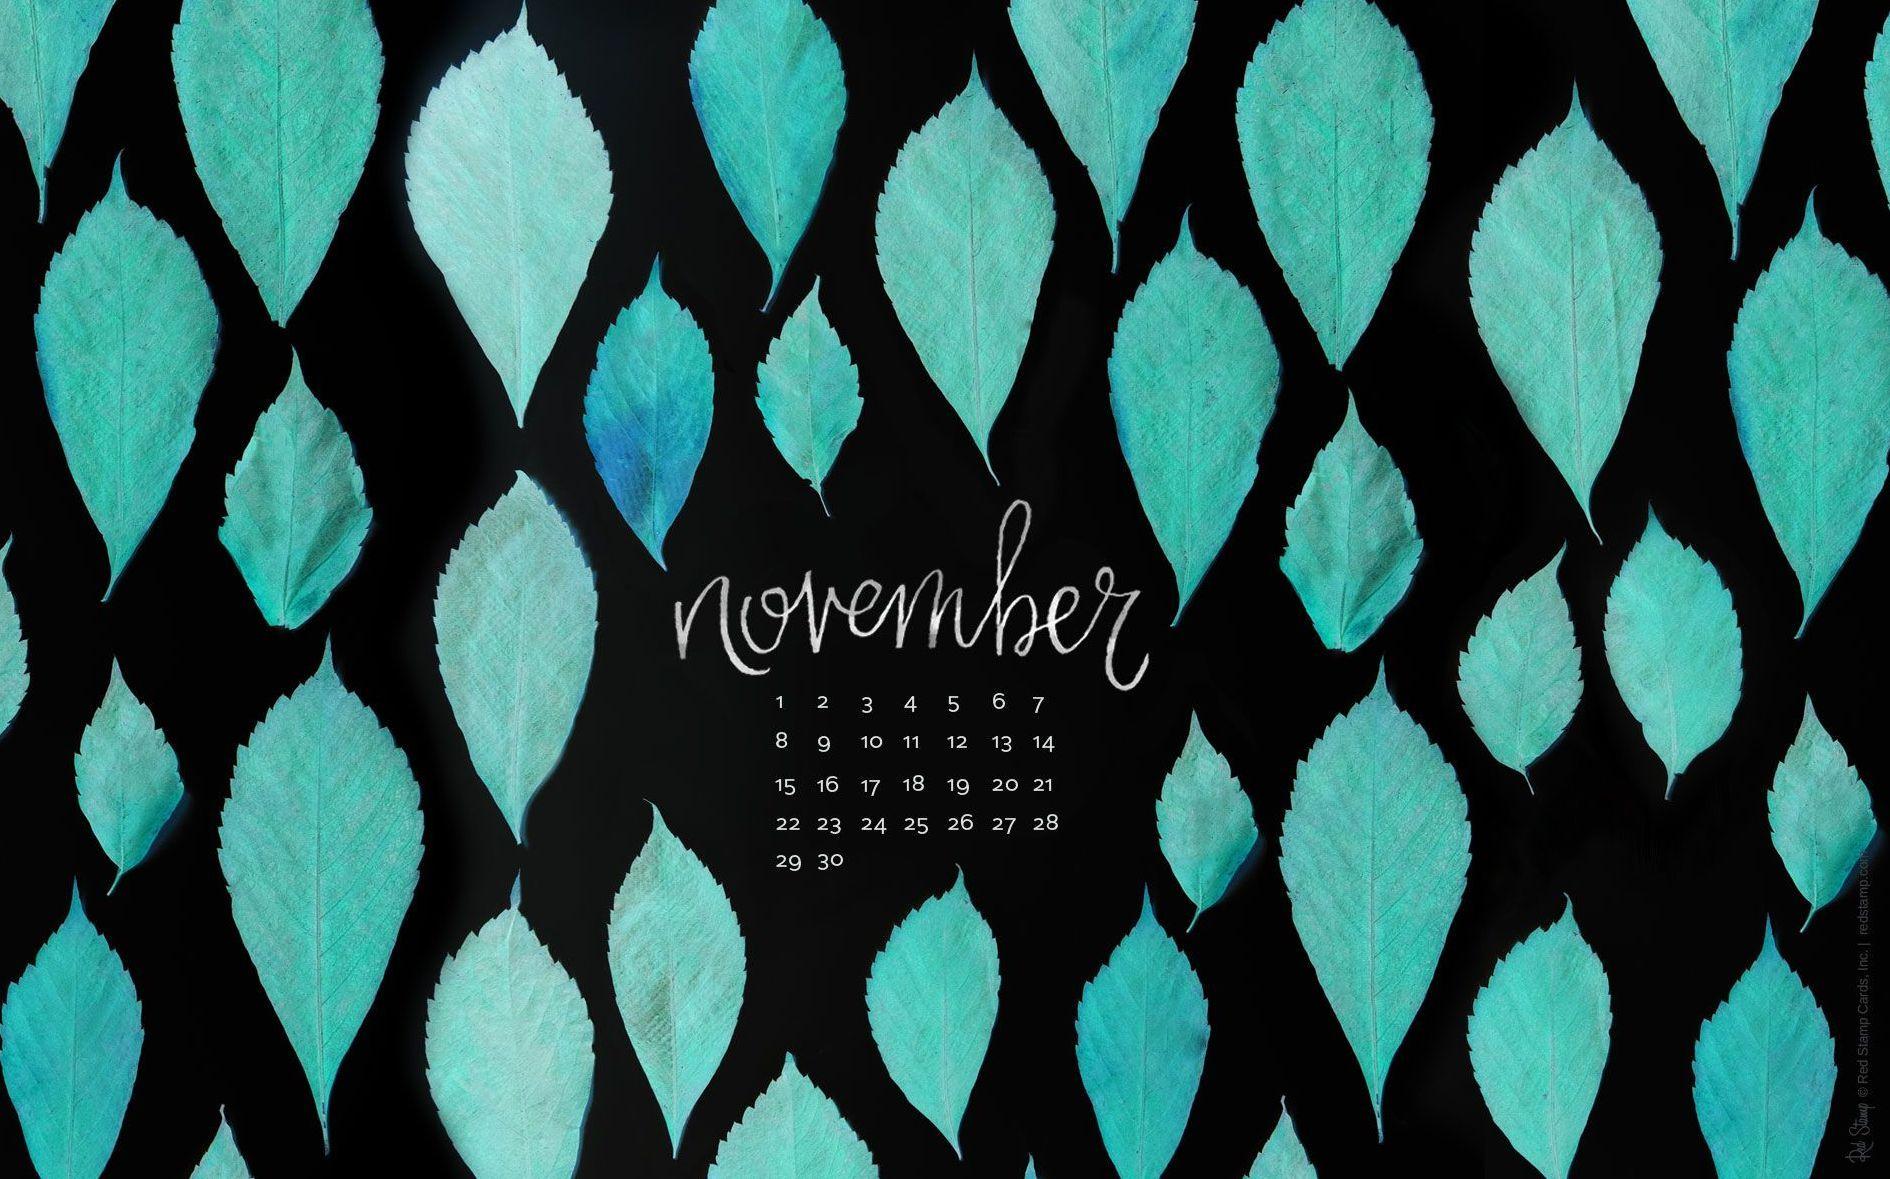 November 2018 Calendar Wallpaper Calendar Wallpaper November Wallpaper Wallpaper Notebook